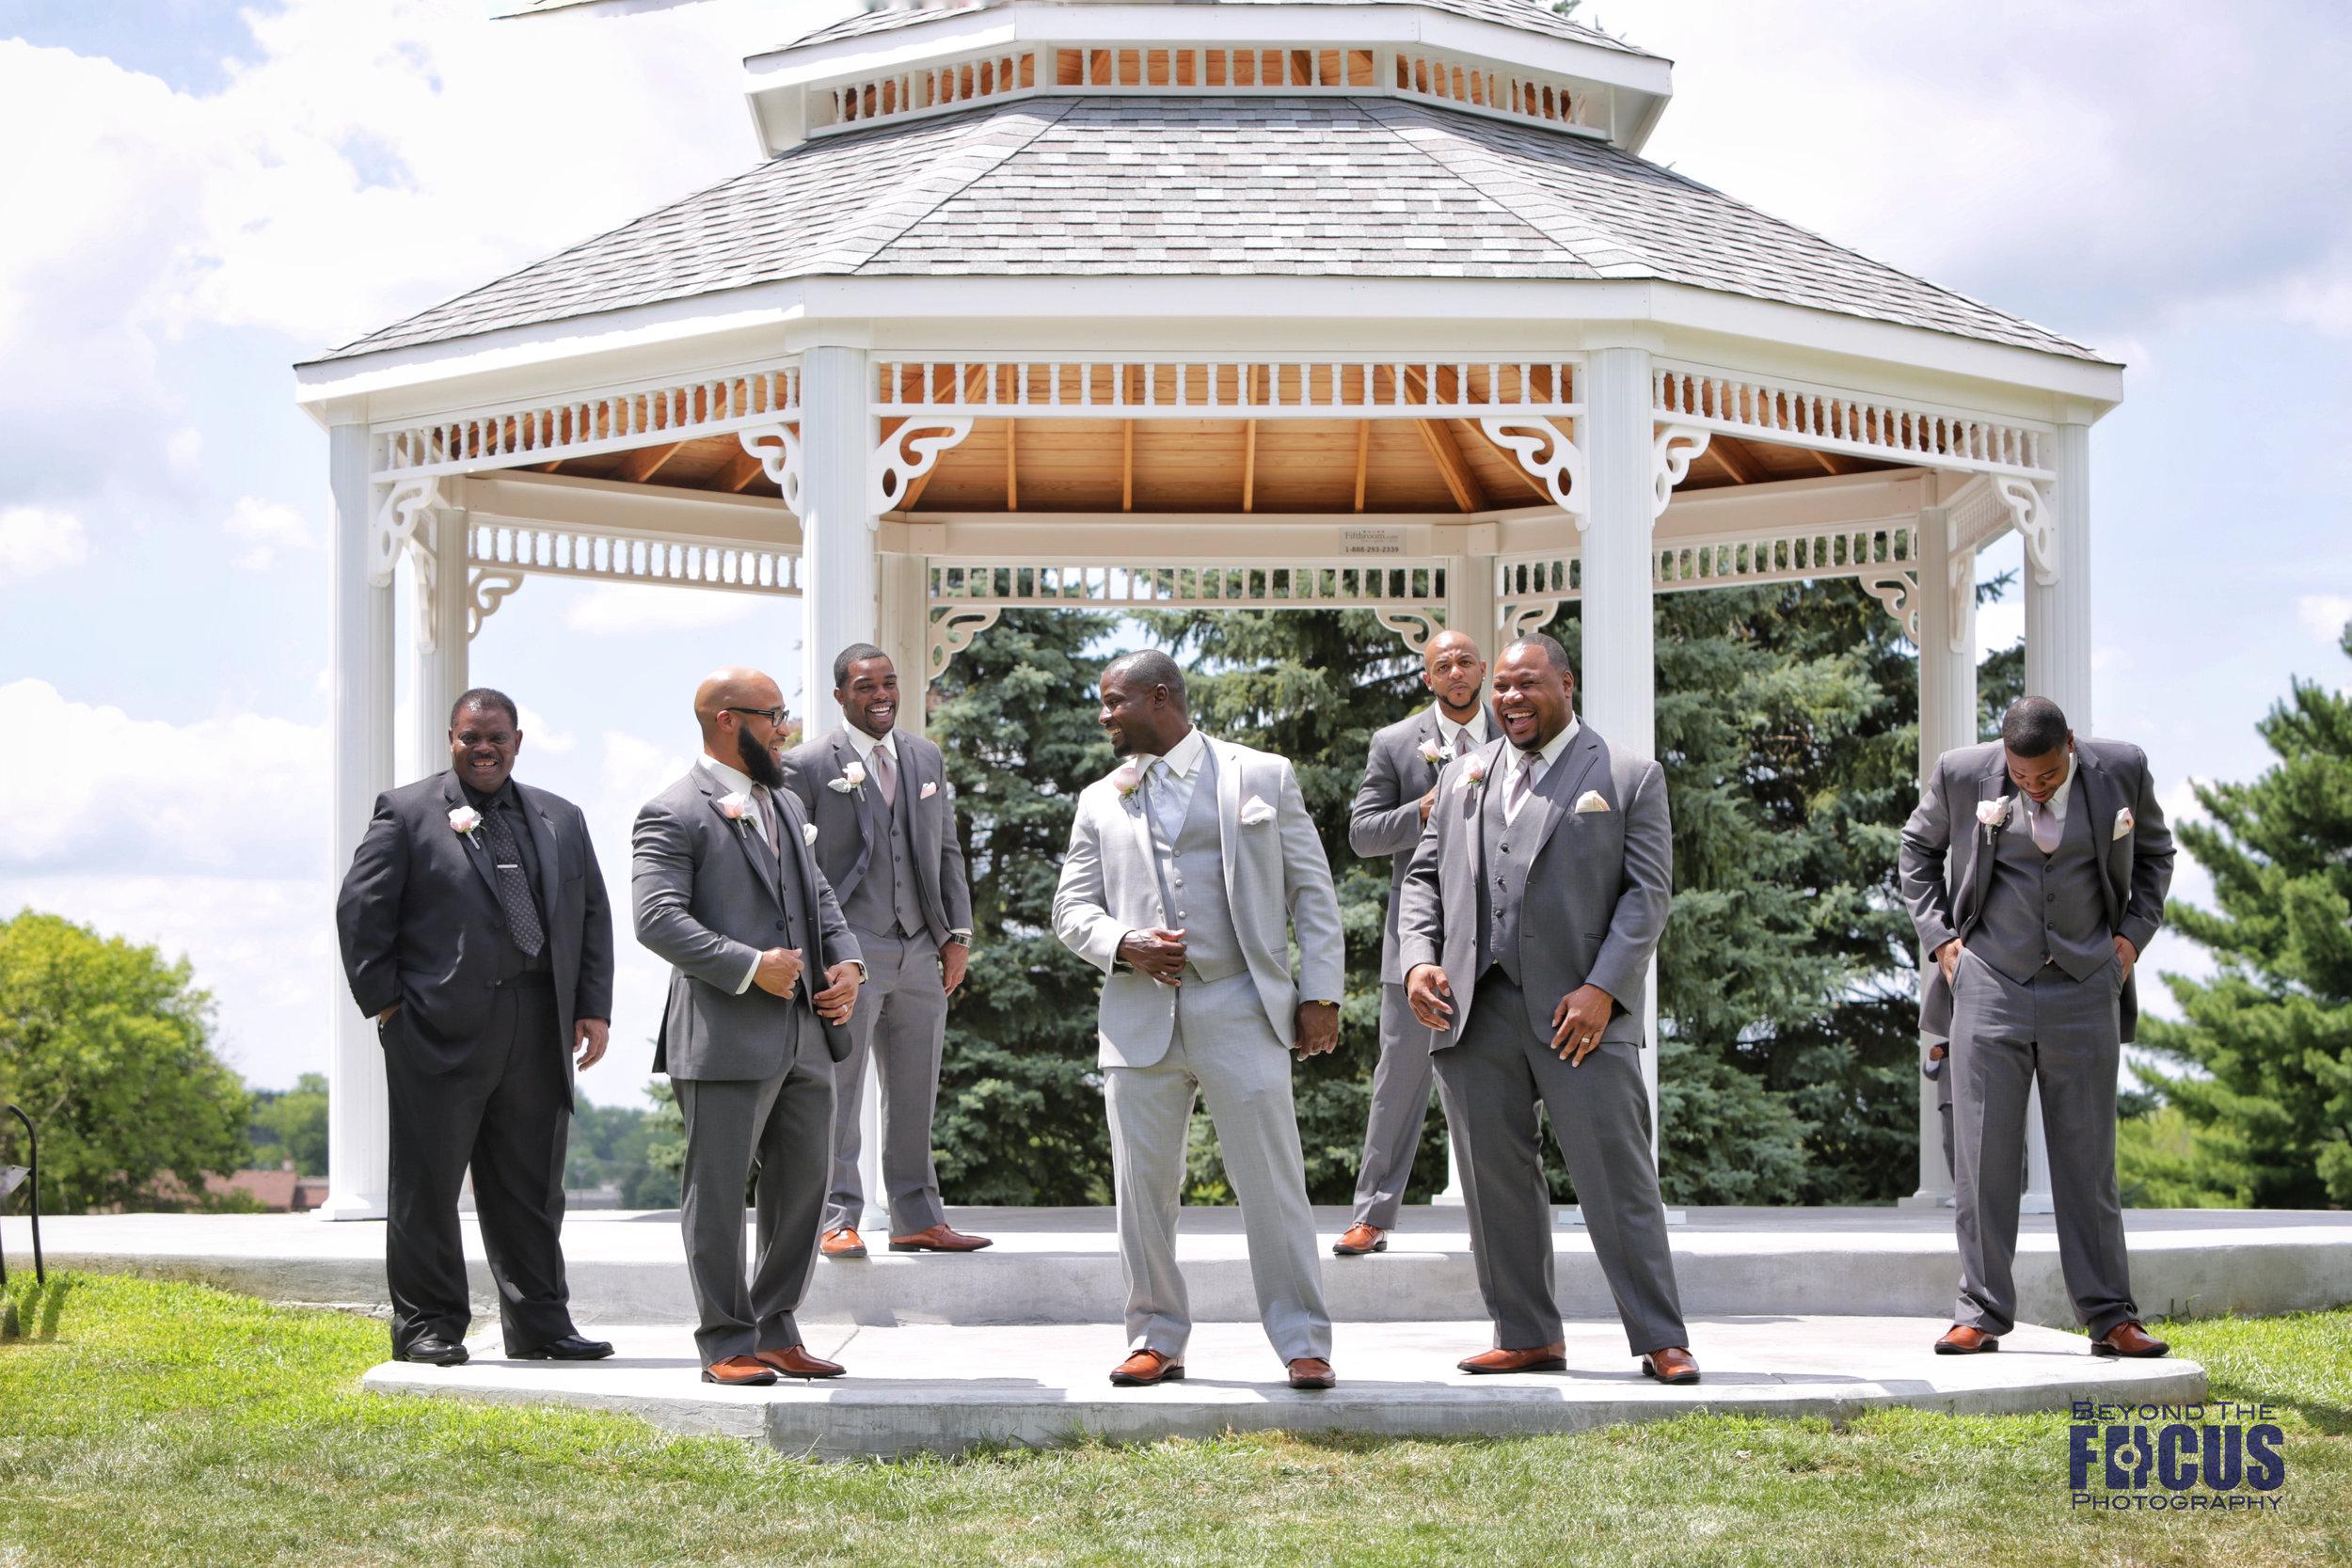 Palmer Wedding - Pre-Wedding Photos Guys1.jpg